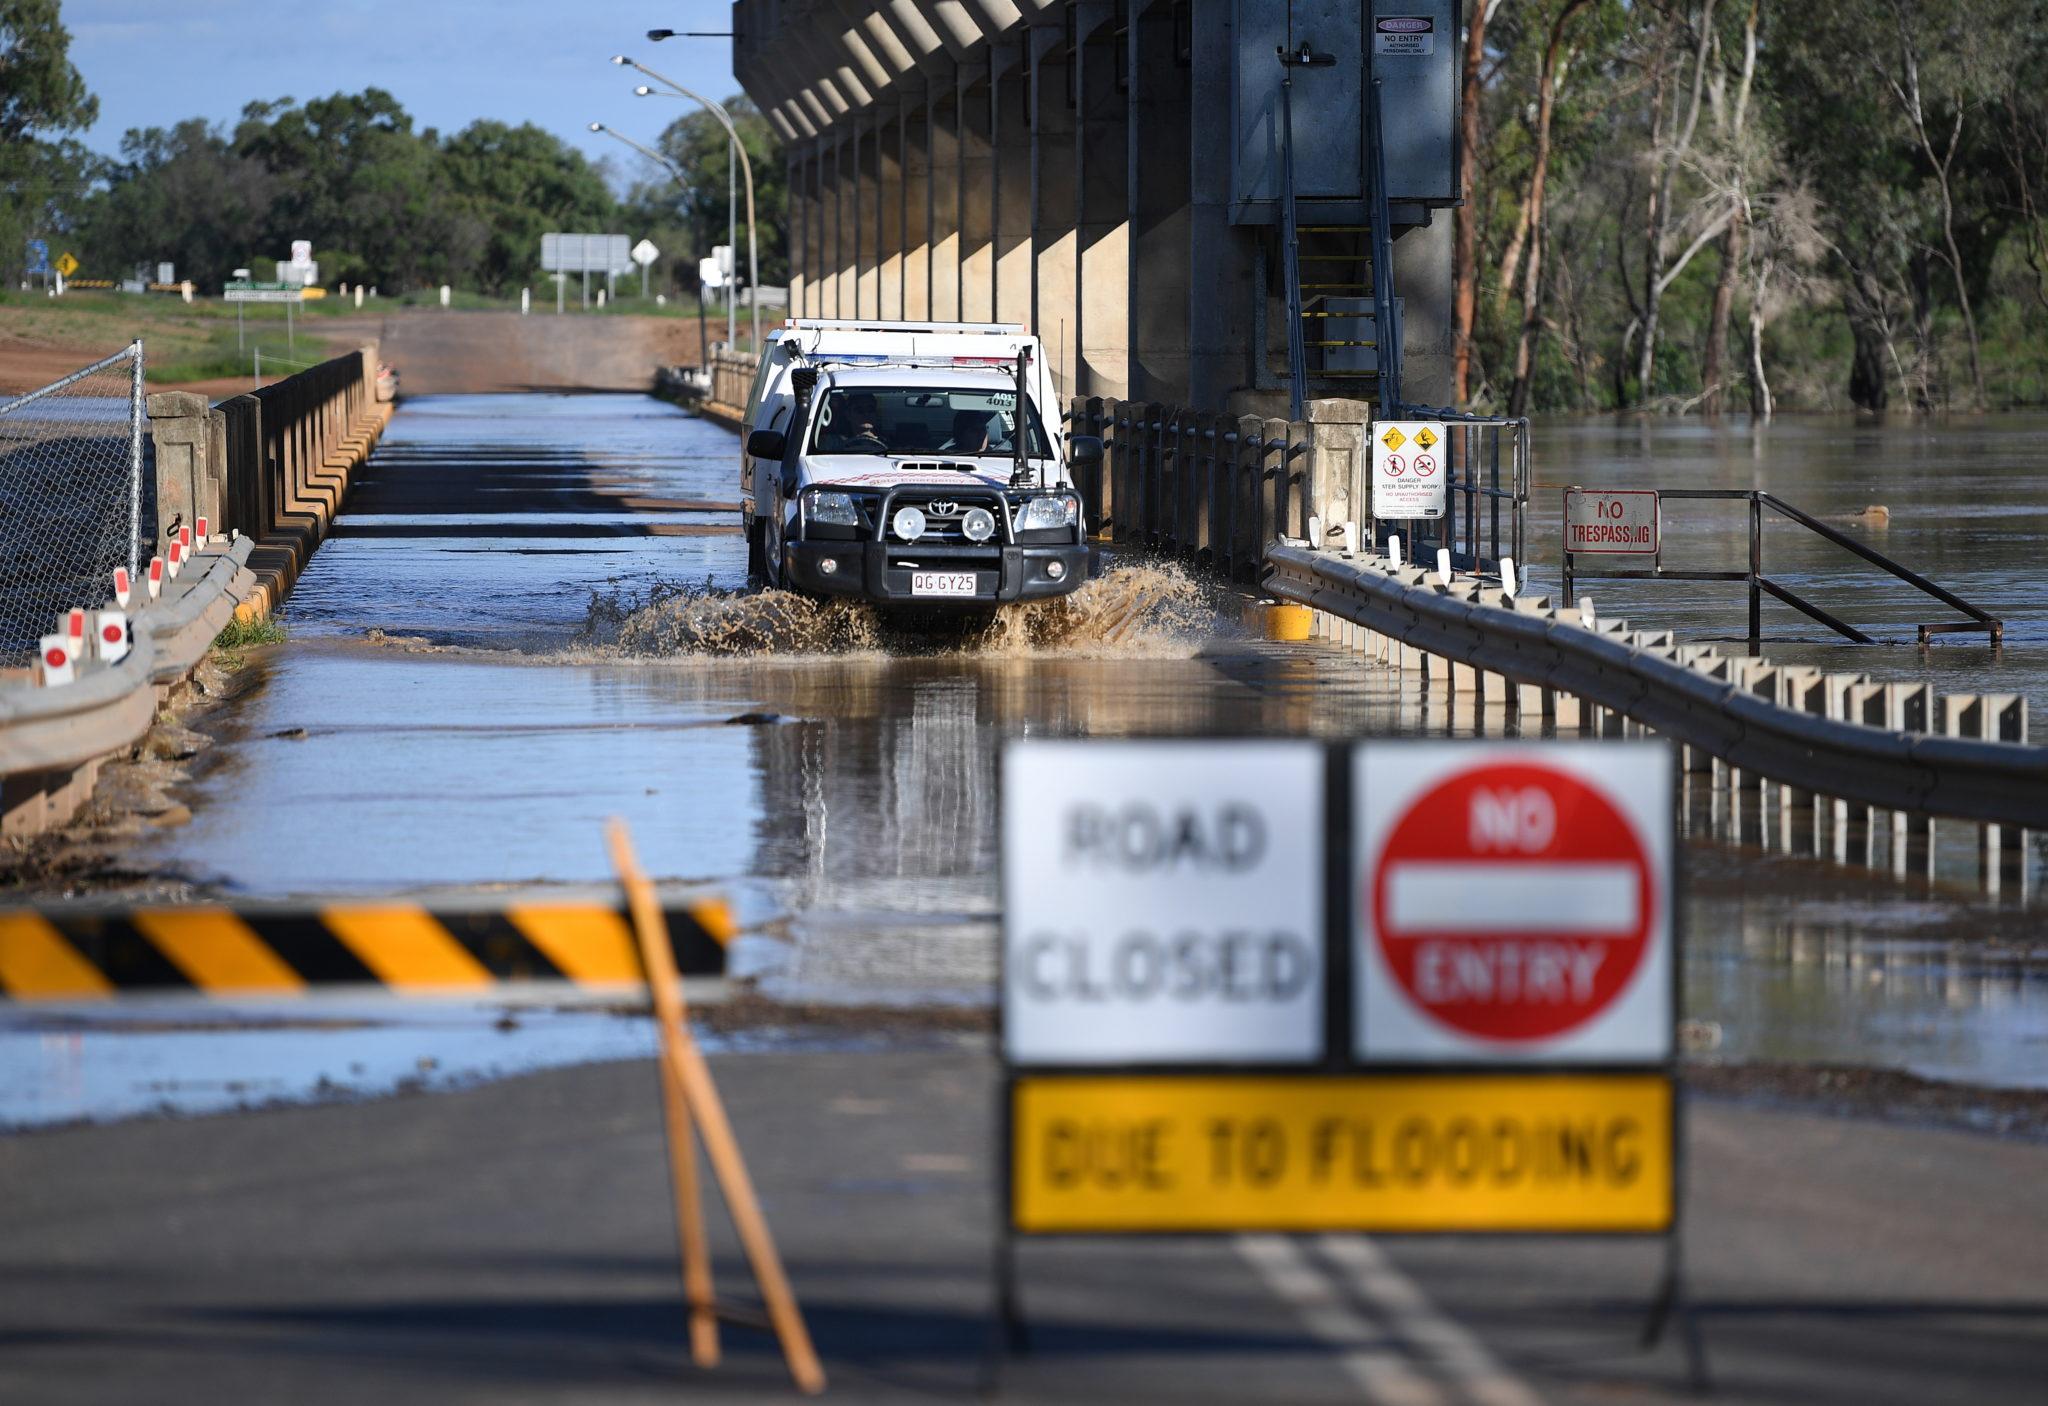 Powodzie w Australii. fot. EPA/DAN PELED